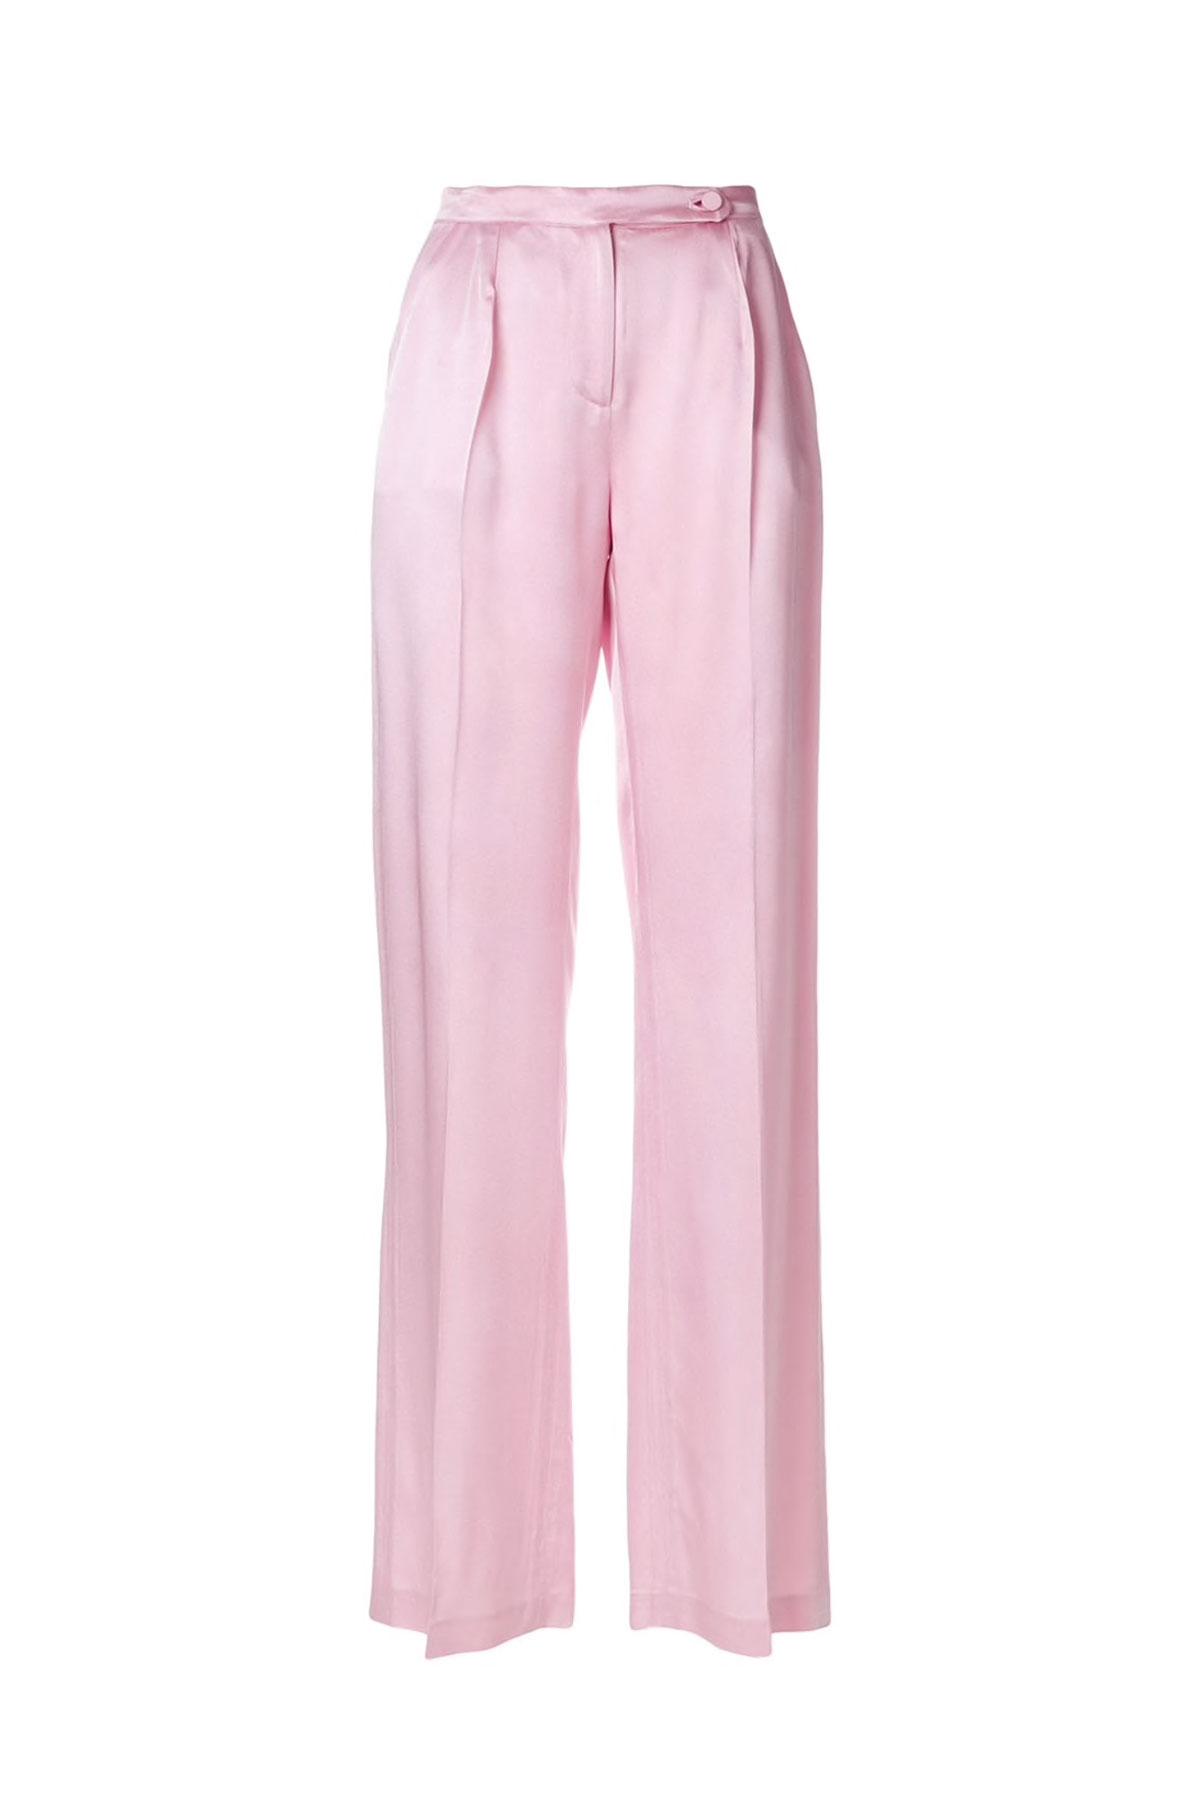 SATIN WIDE-LEG CRYSTAL ROSE PANTS